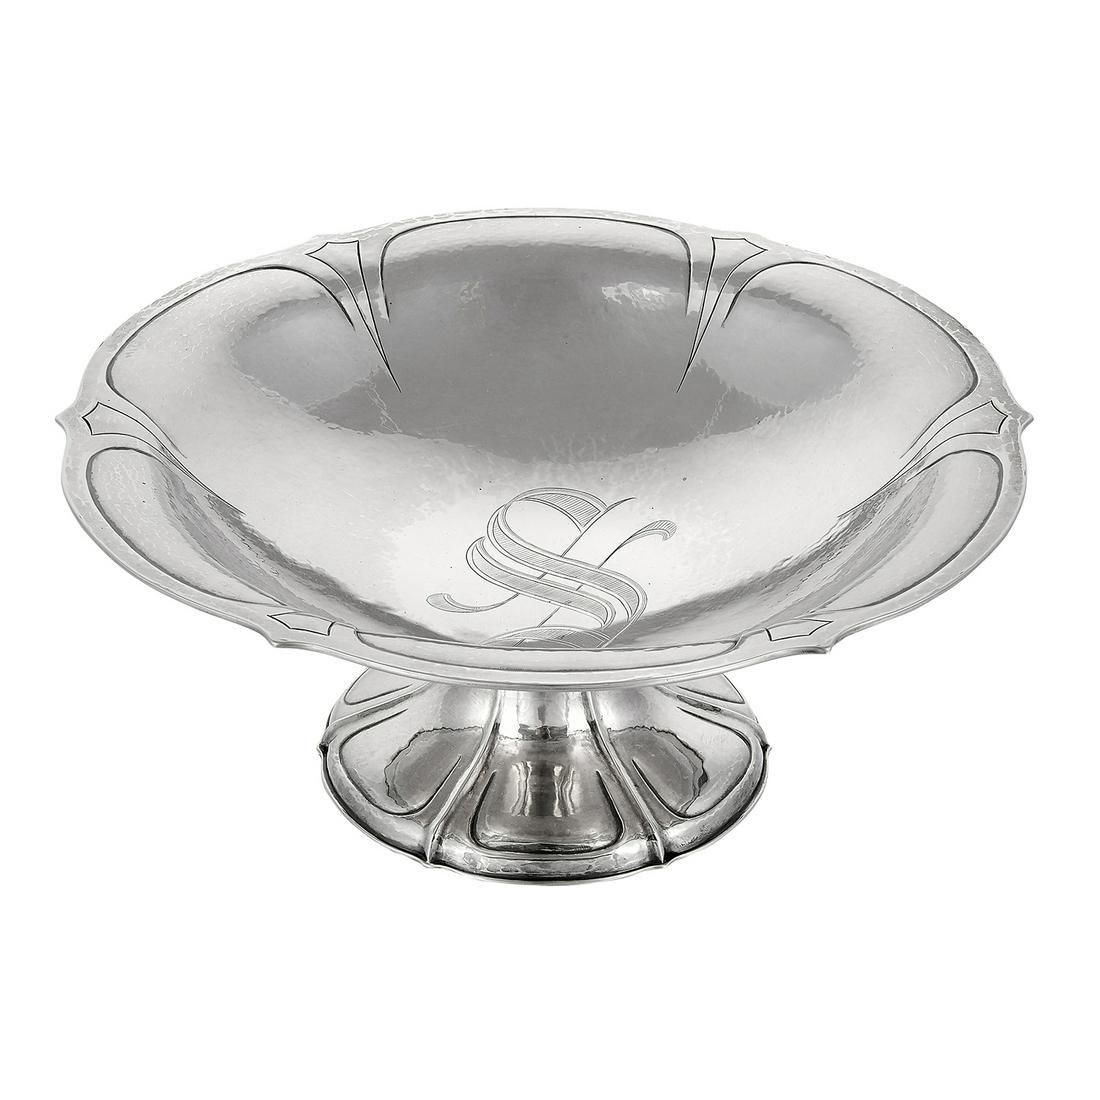 Julius Olaf Randahl round footed bowl, #729